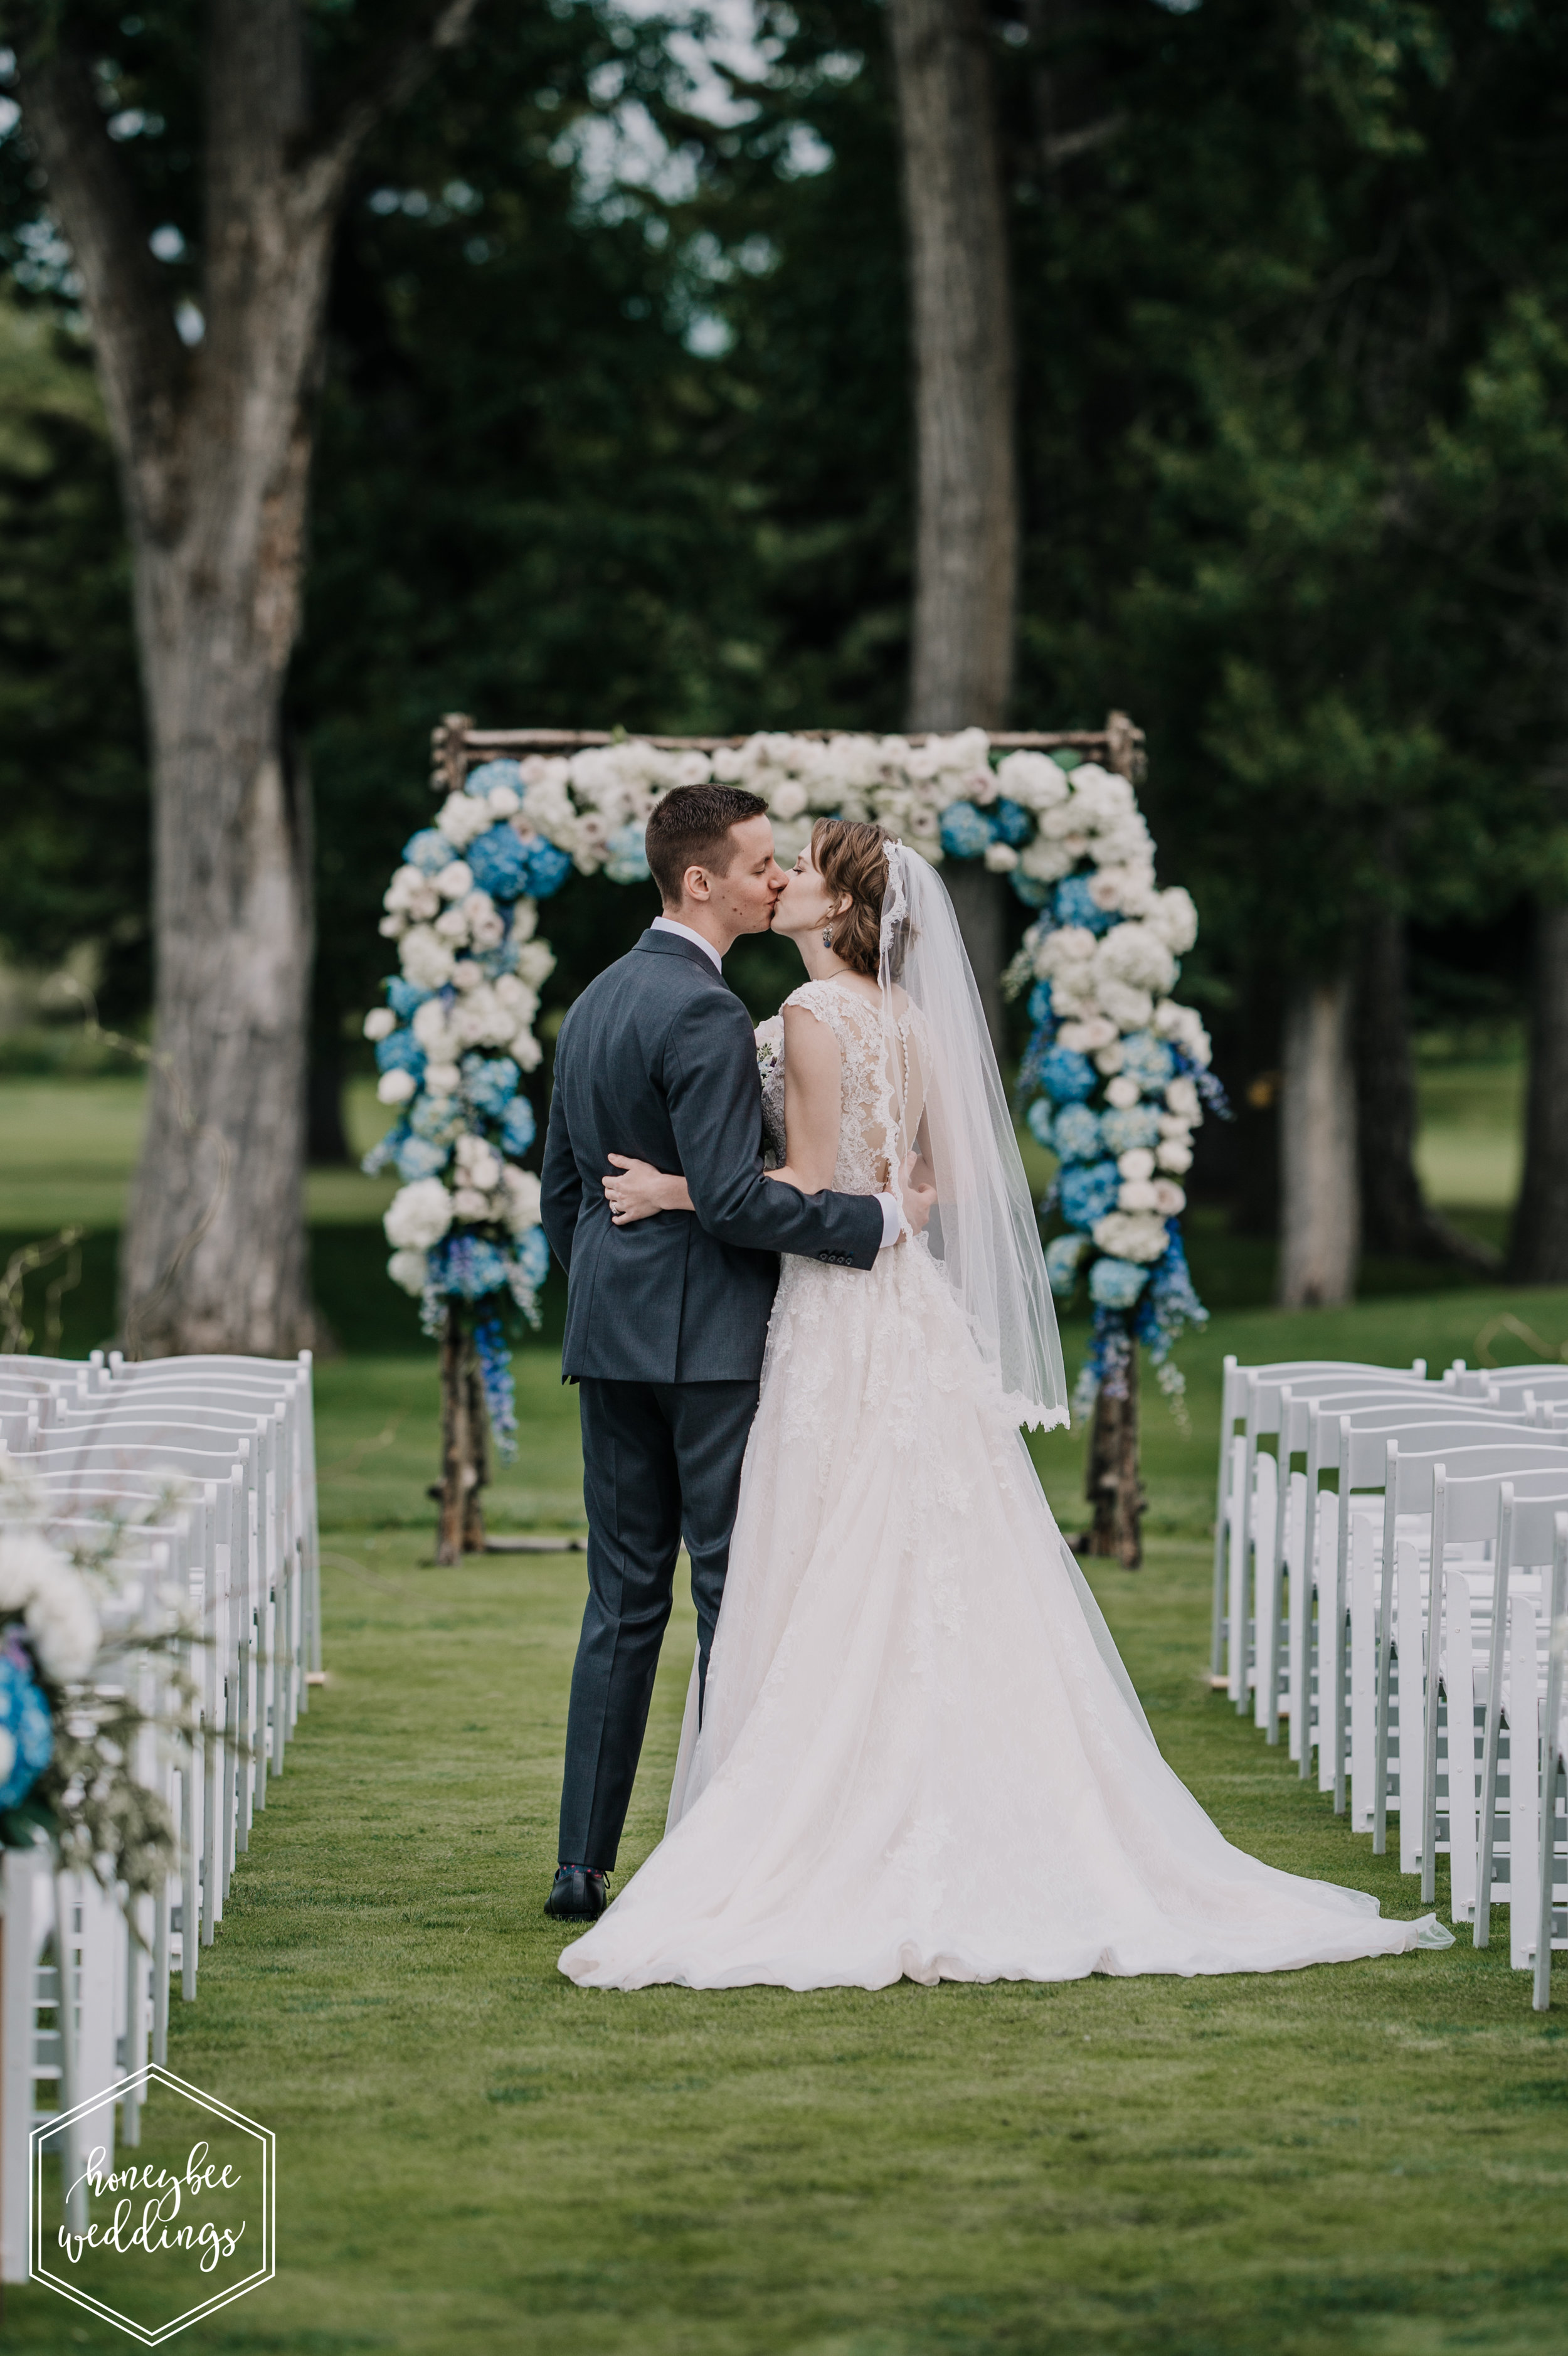 853 Riverside Country Club Wedding_Montana Wedding Photographer_Lauren Jackson + Evan Ivaldi 2018-6867.jpg